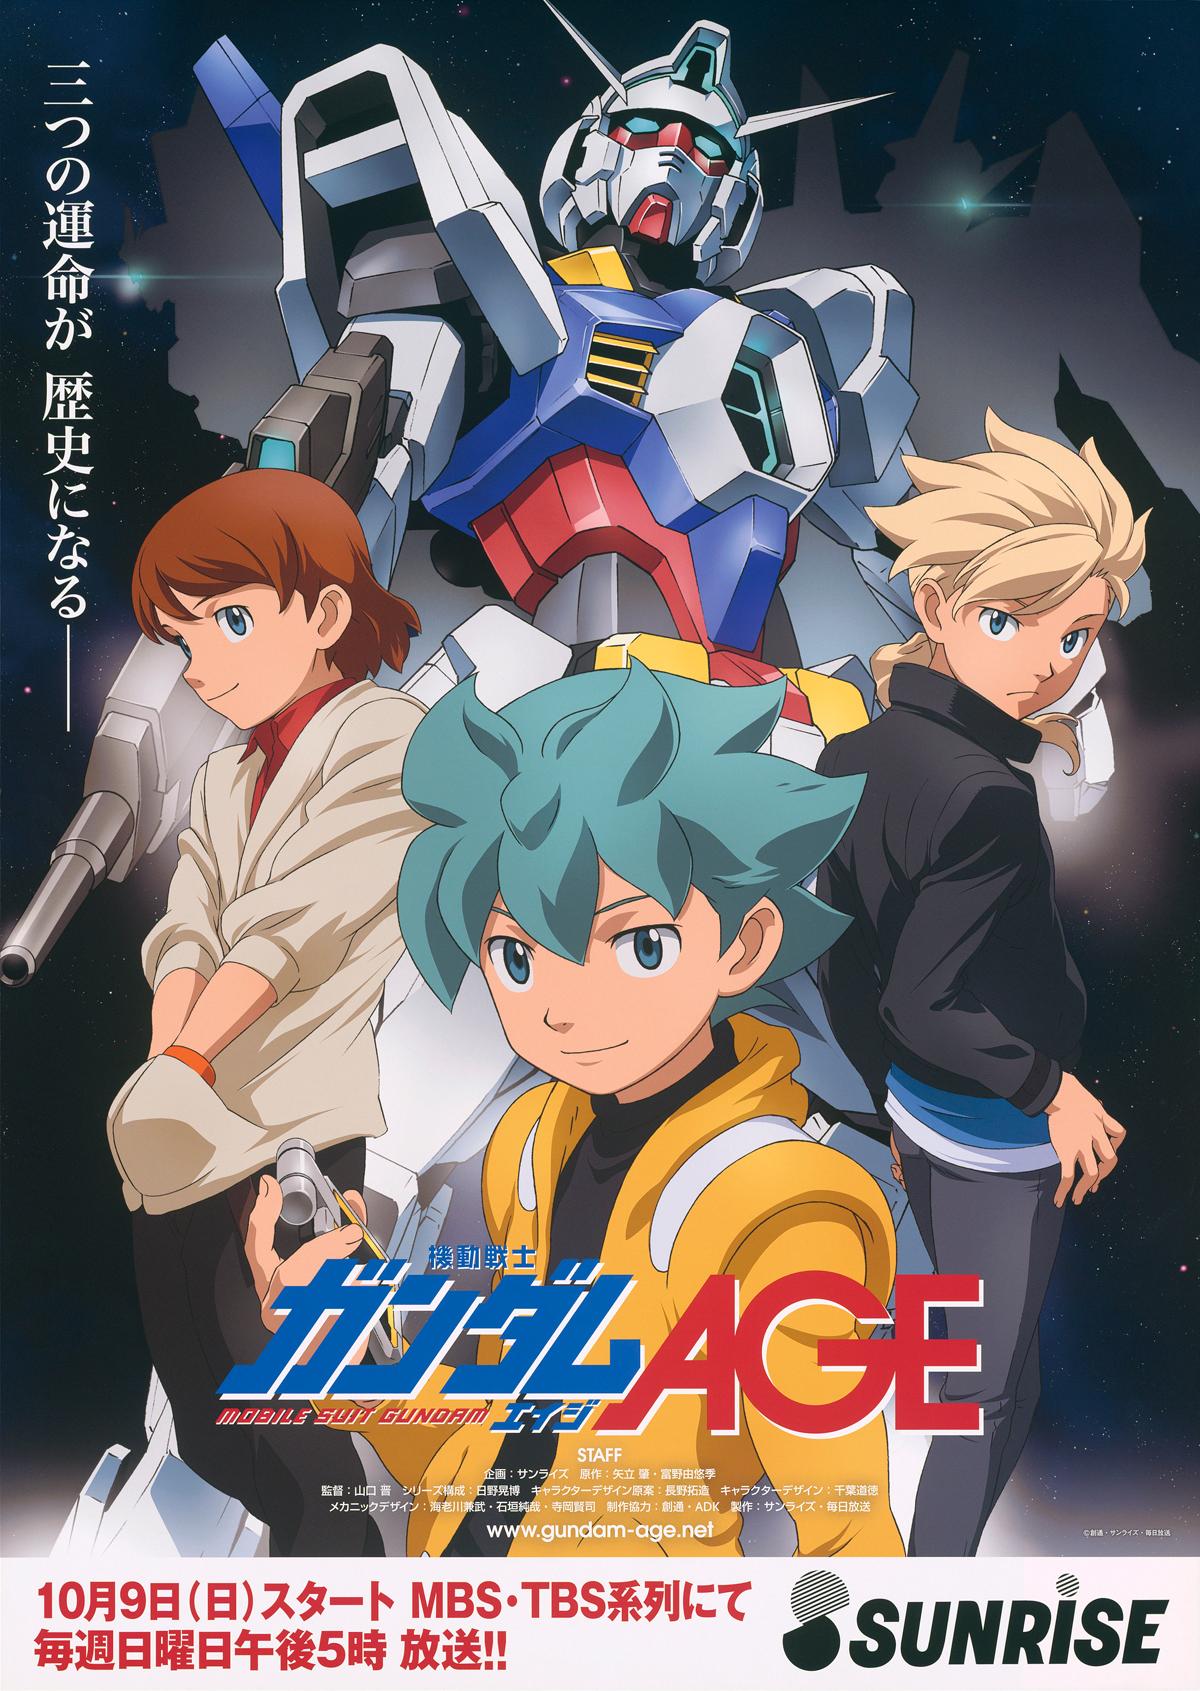 Mobile Suit Gundam AGE | The Gundam Wiki | FANDOM powered by Wikia